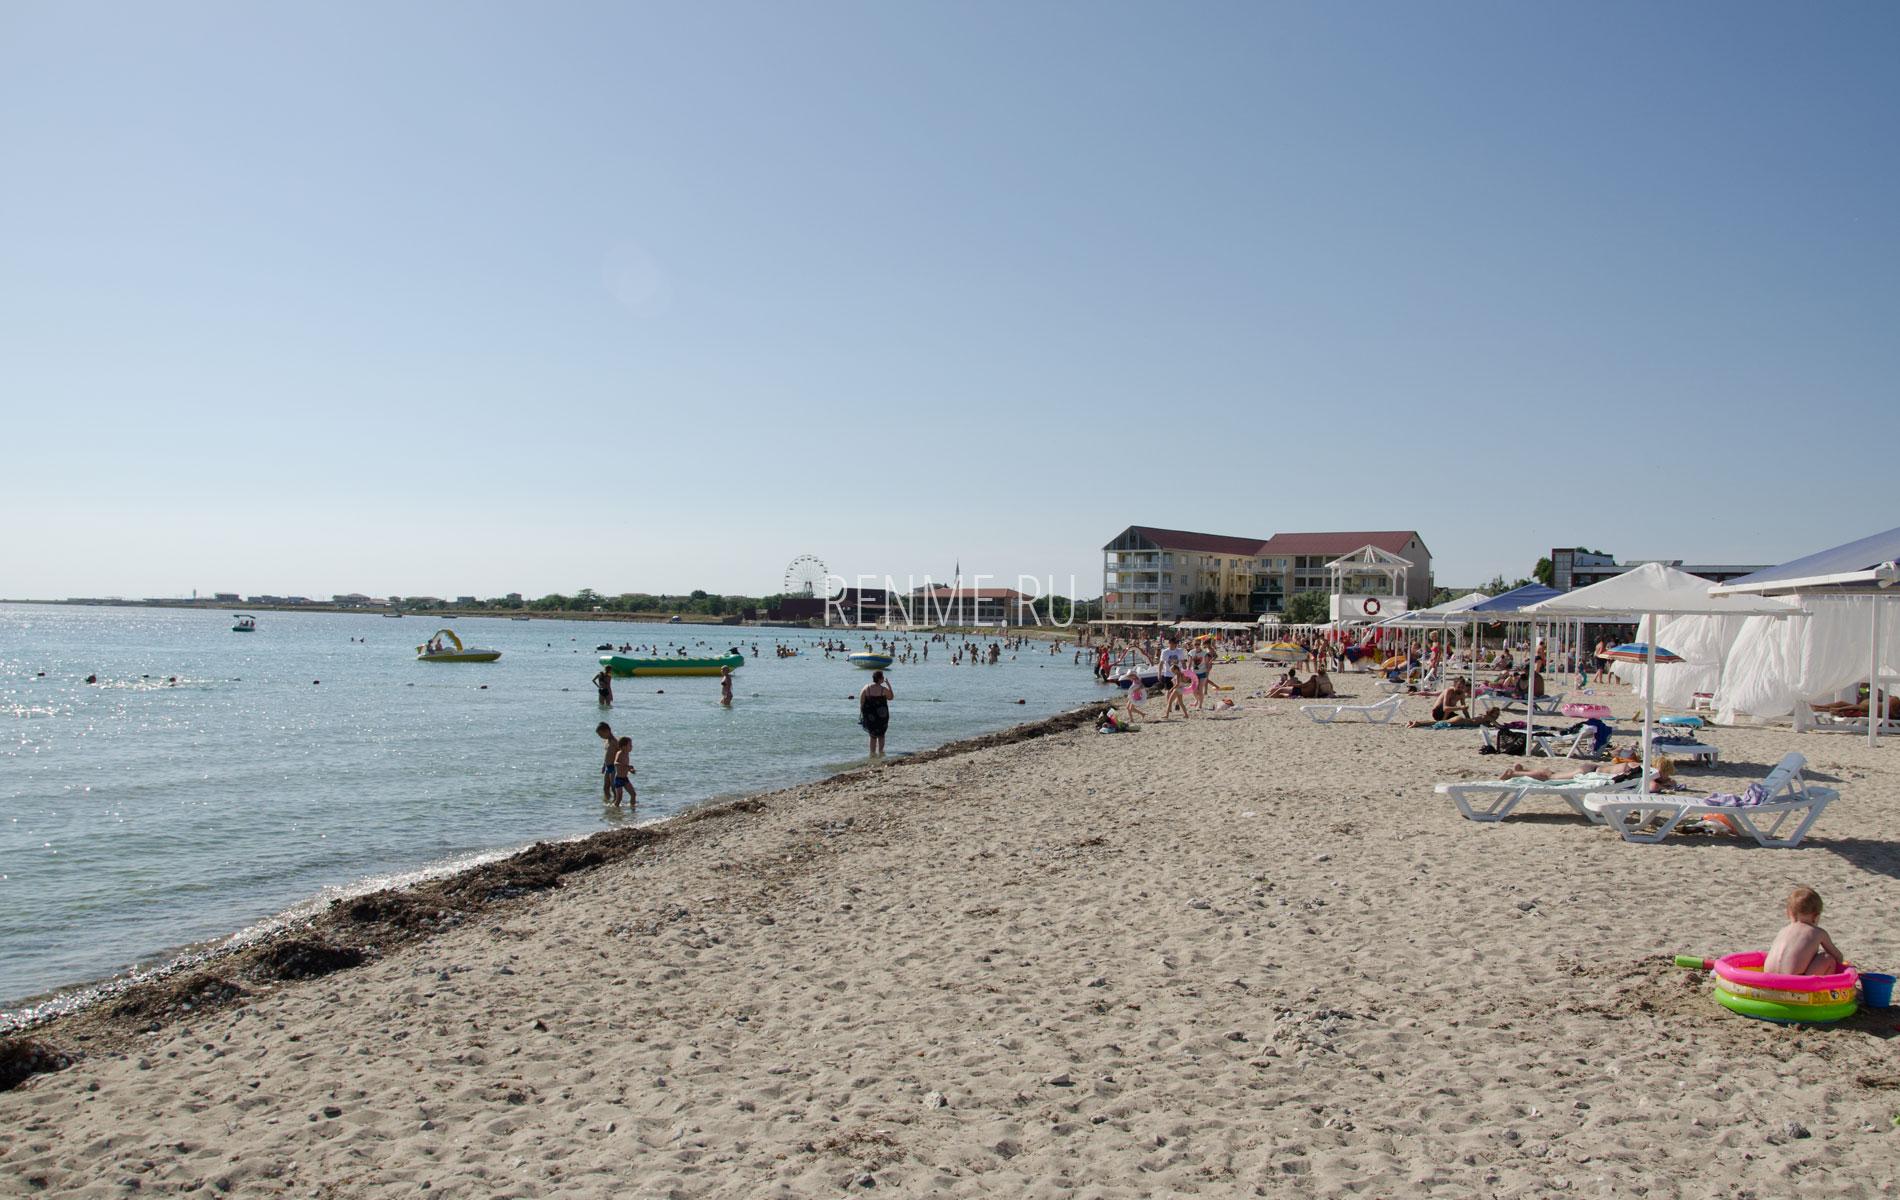 Море с пляжем на Тарханкуте. Фото Межводного